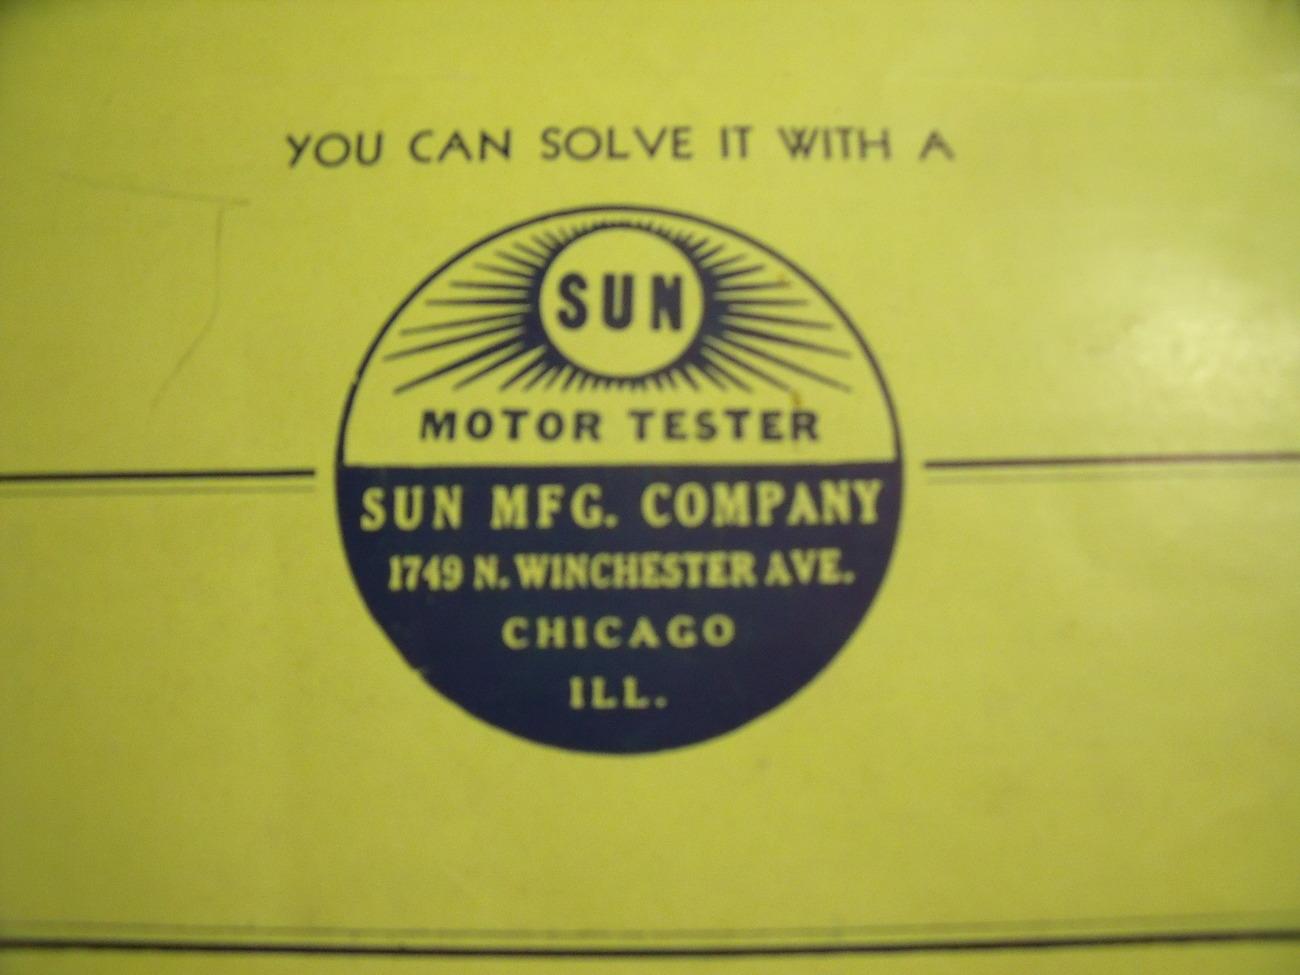 Original Sun Motor Tester Brochure